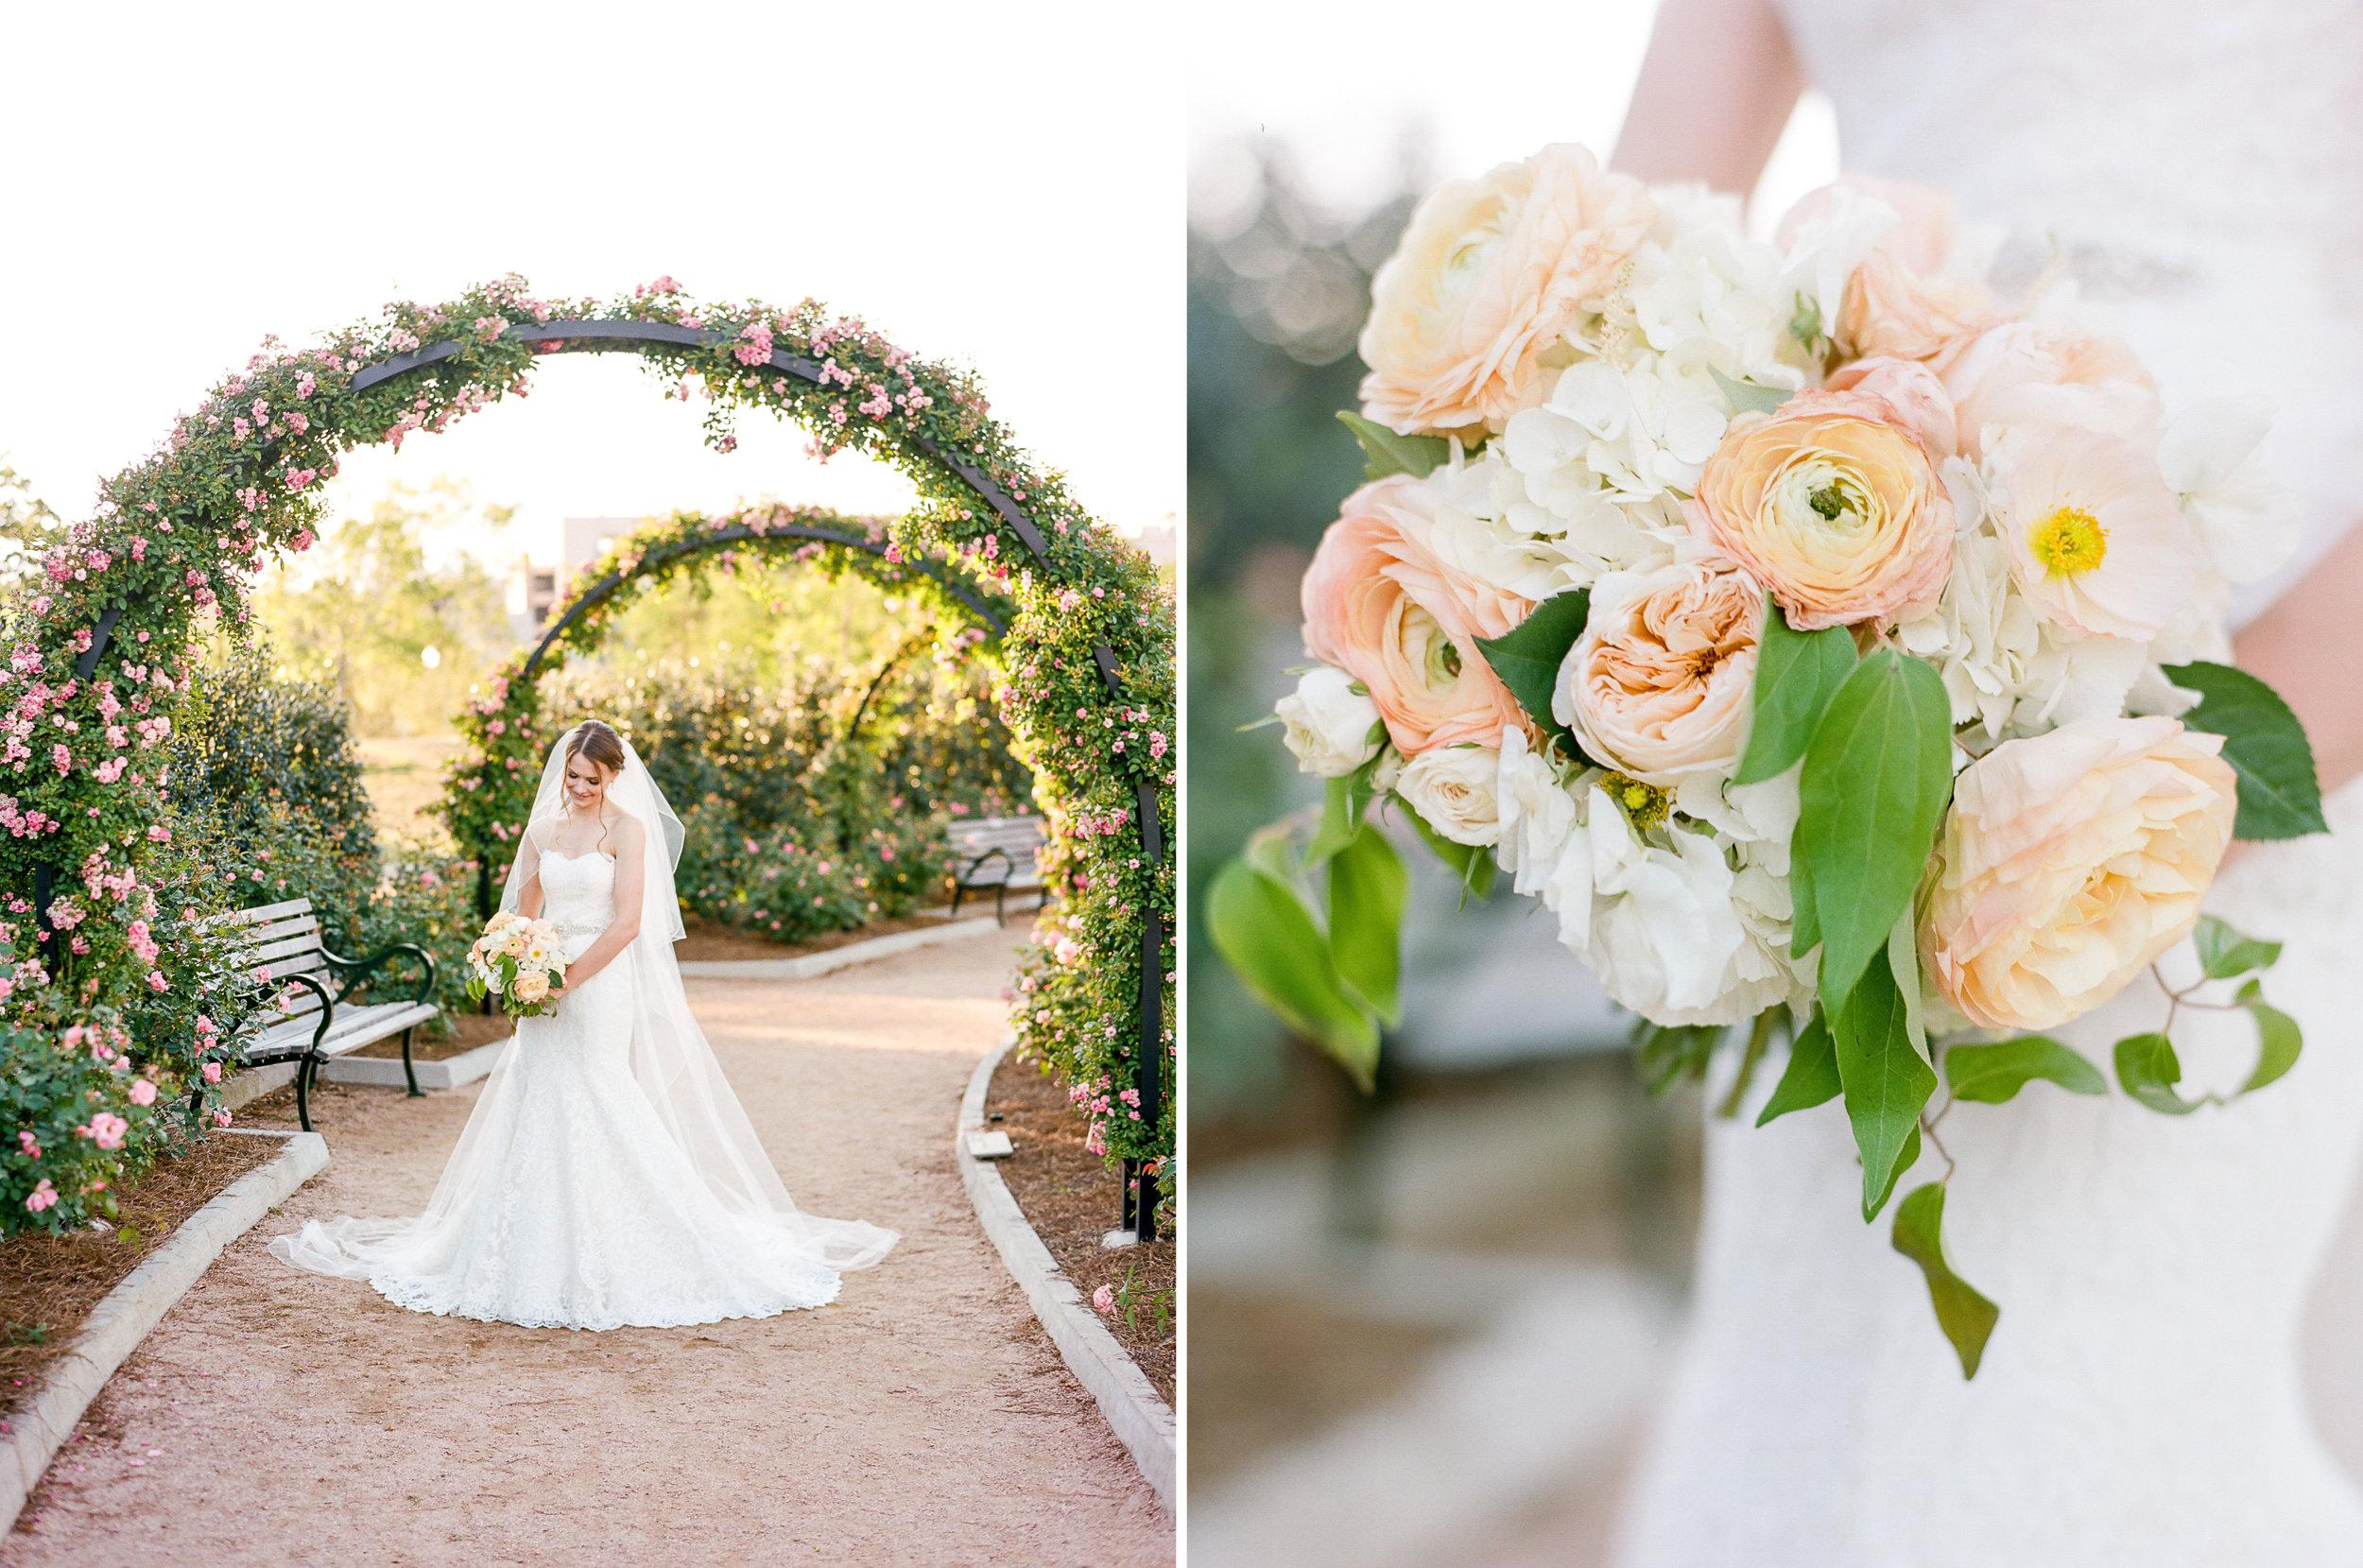 Houston-Wedding-Photographer-Film-Fine-Art-Bridals-Dana Fernandez-Photography-111.jpg